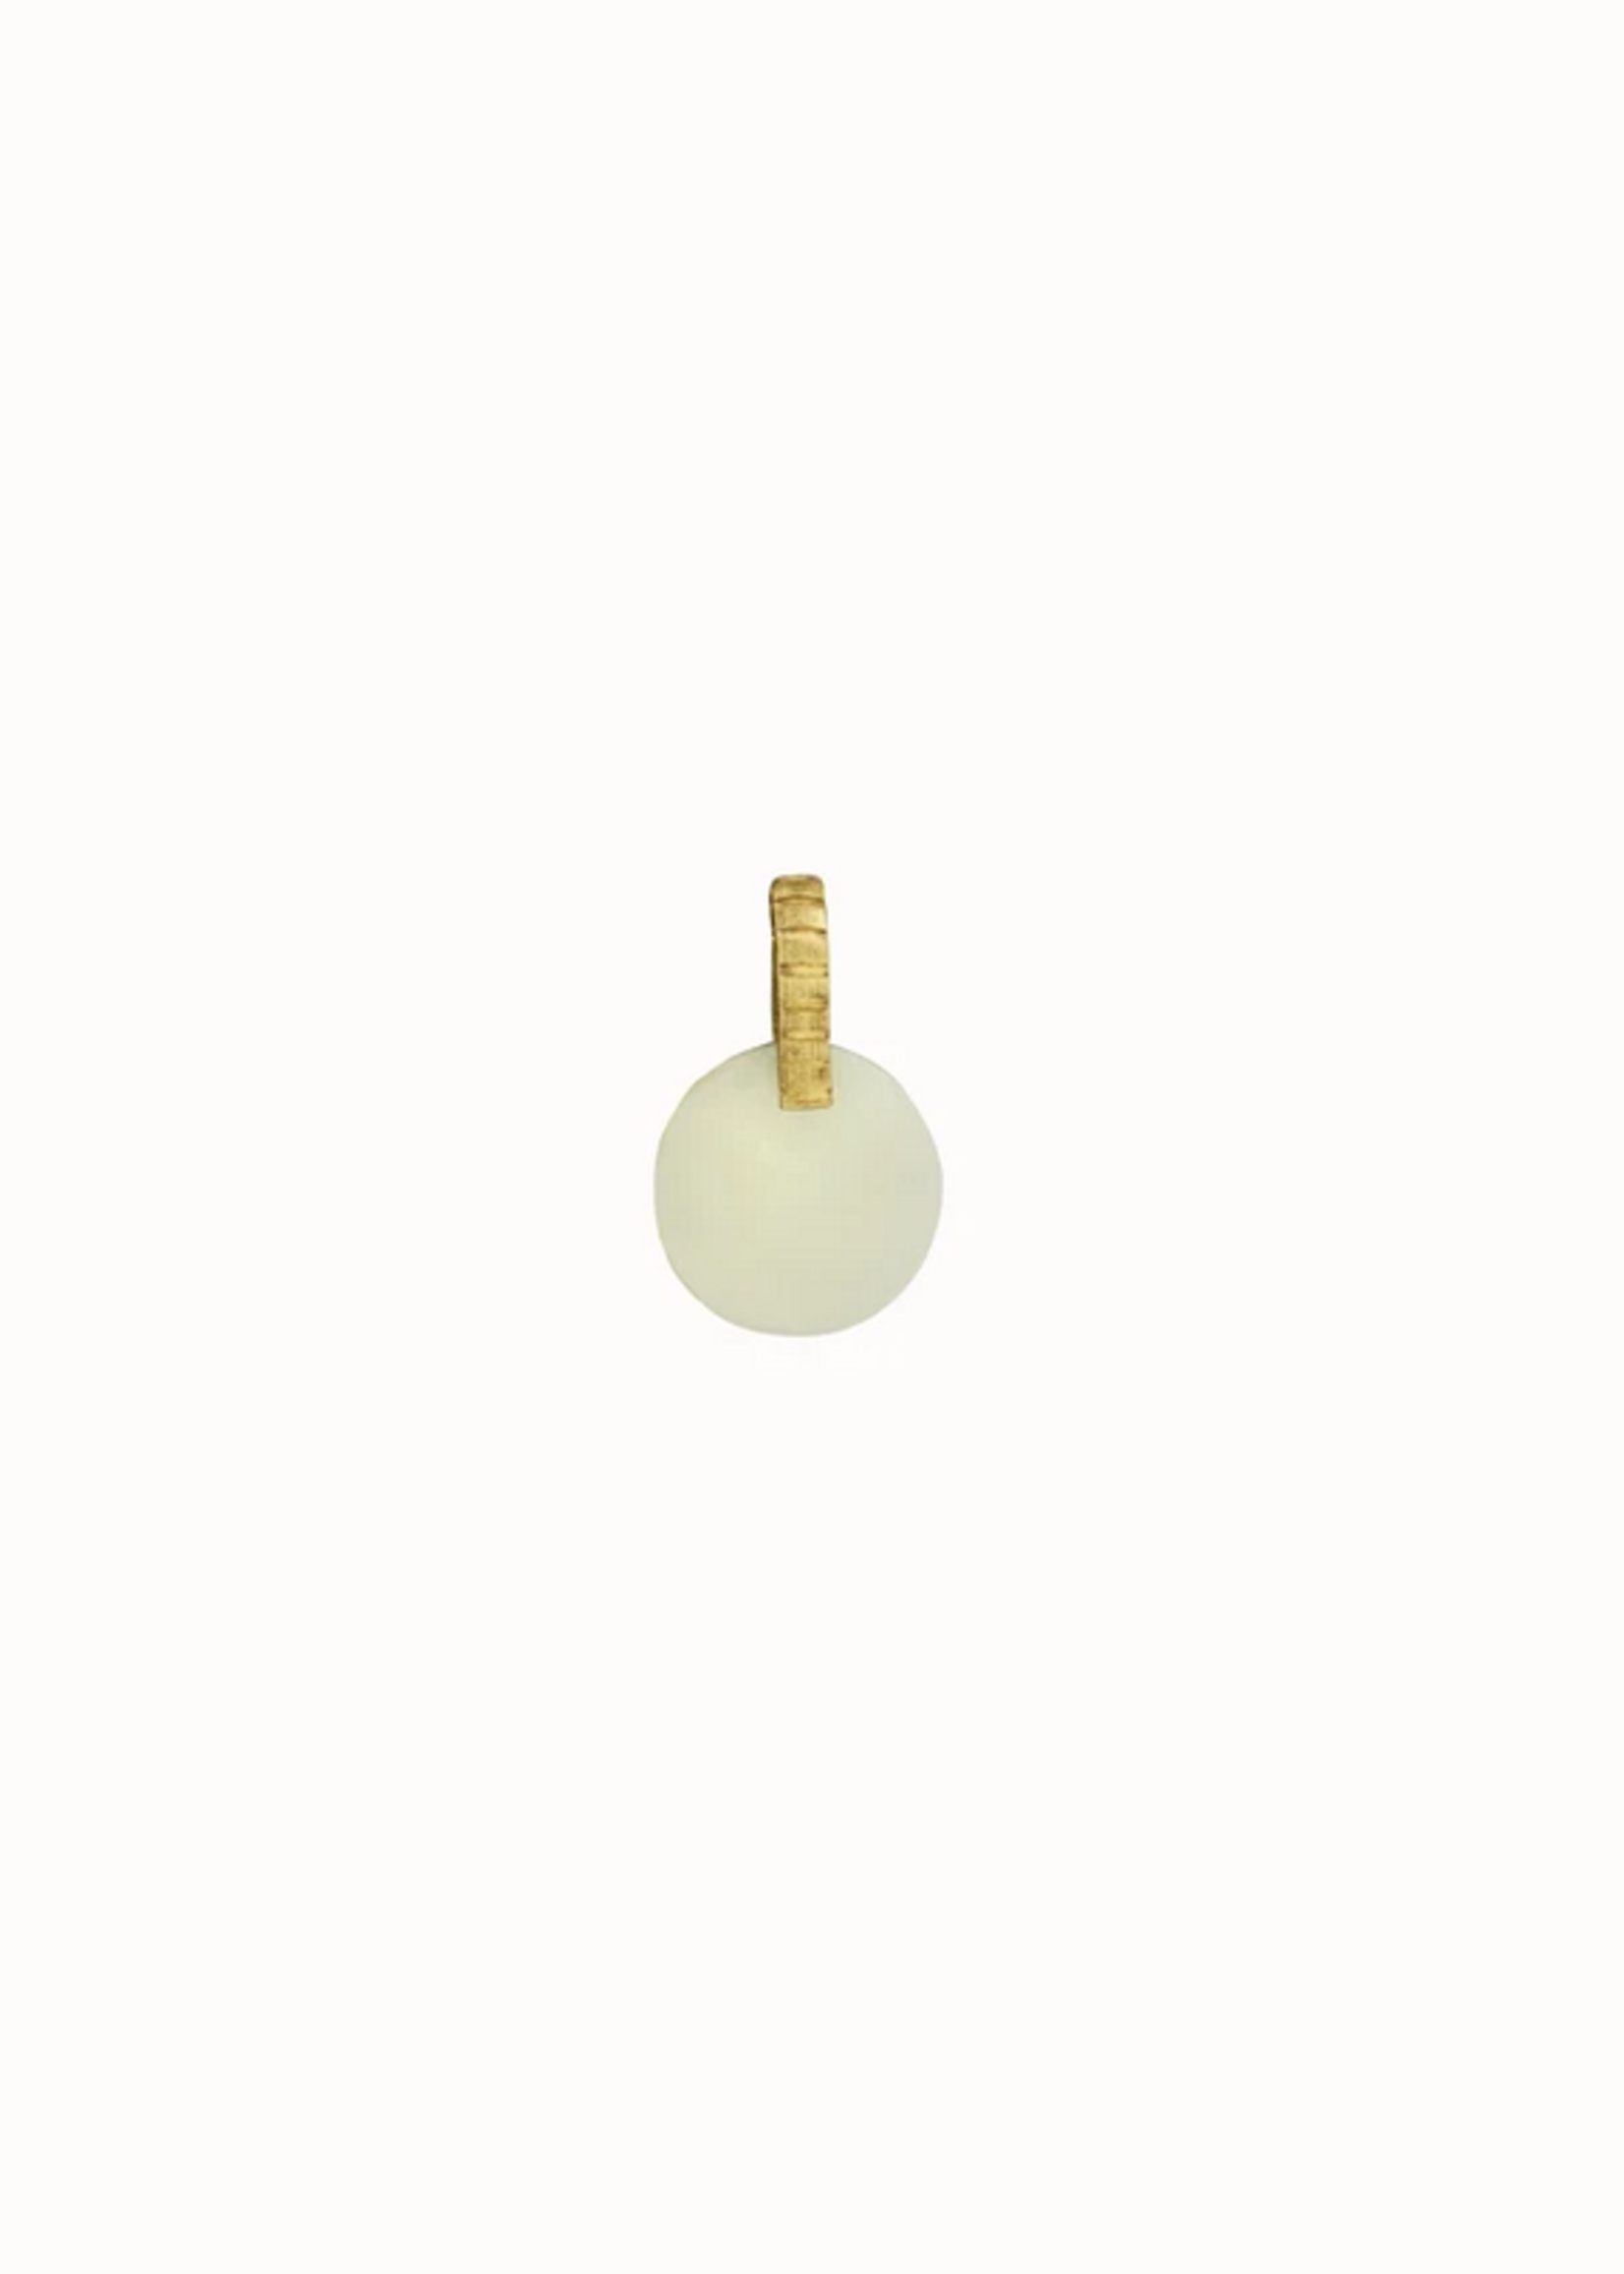 Flawed Ivory charm pendant